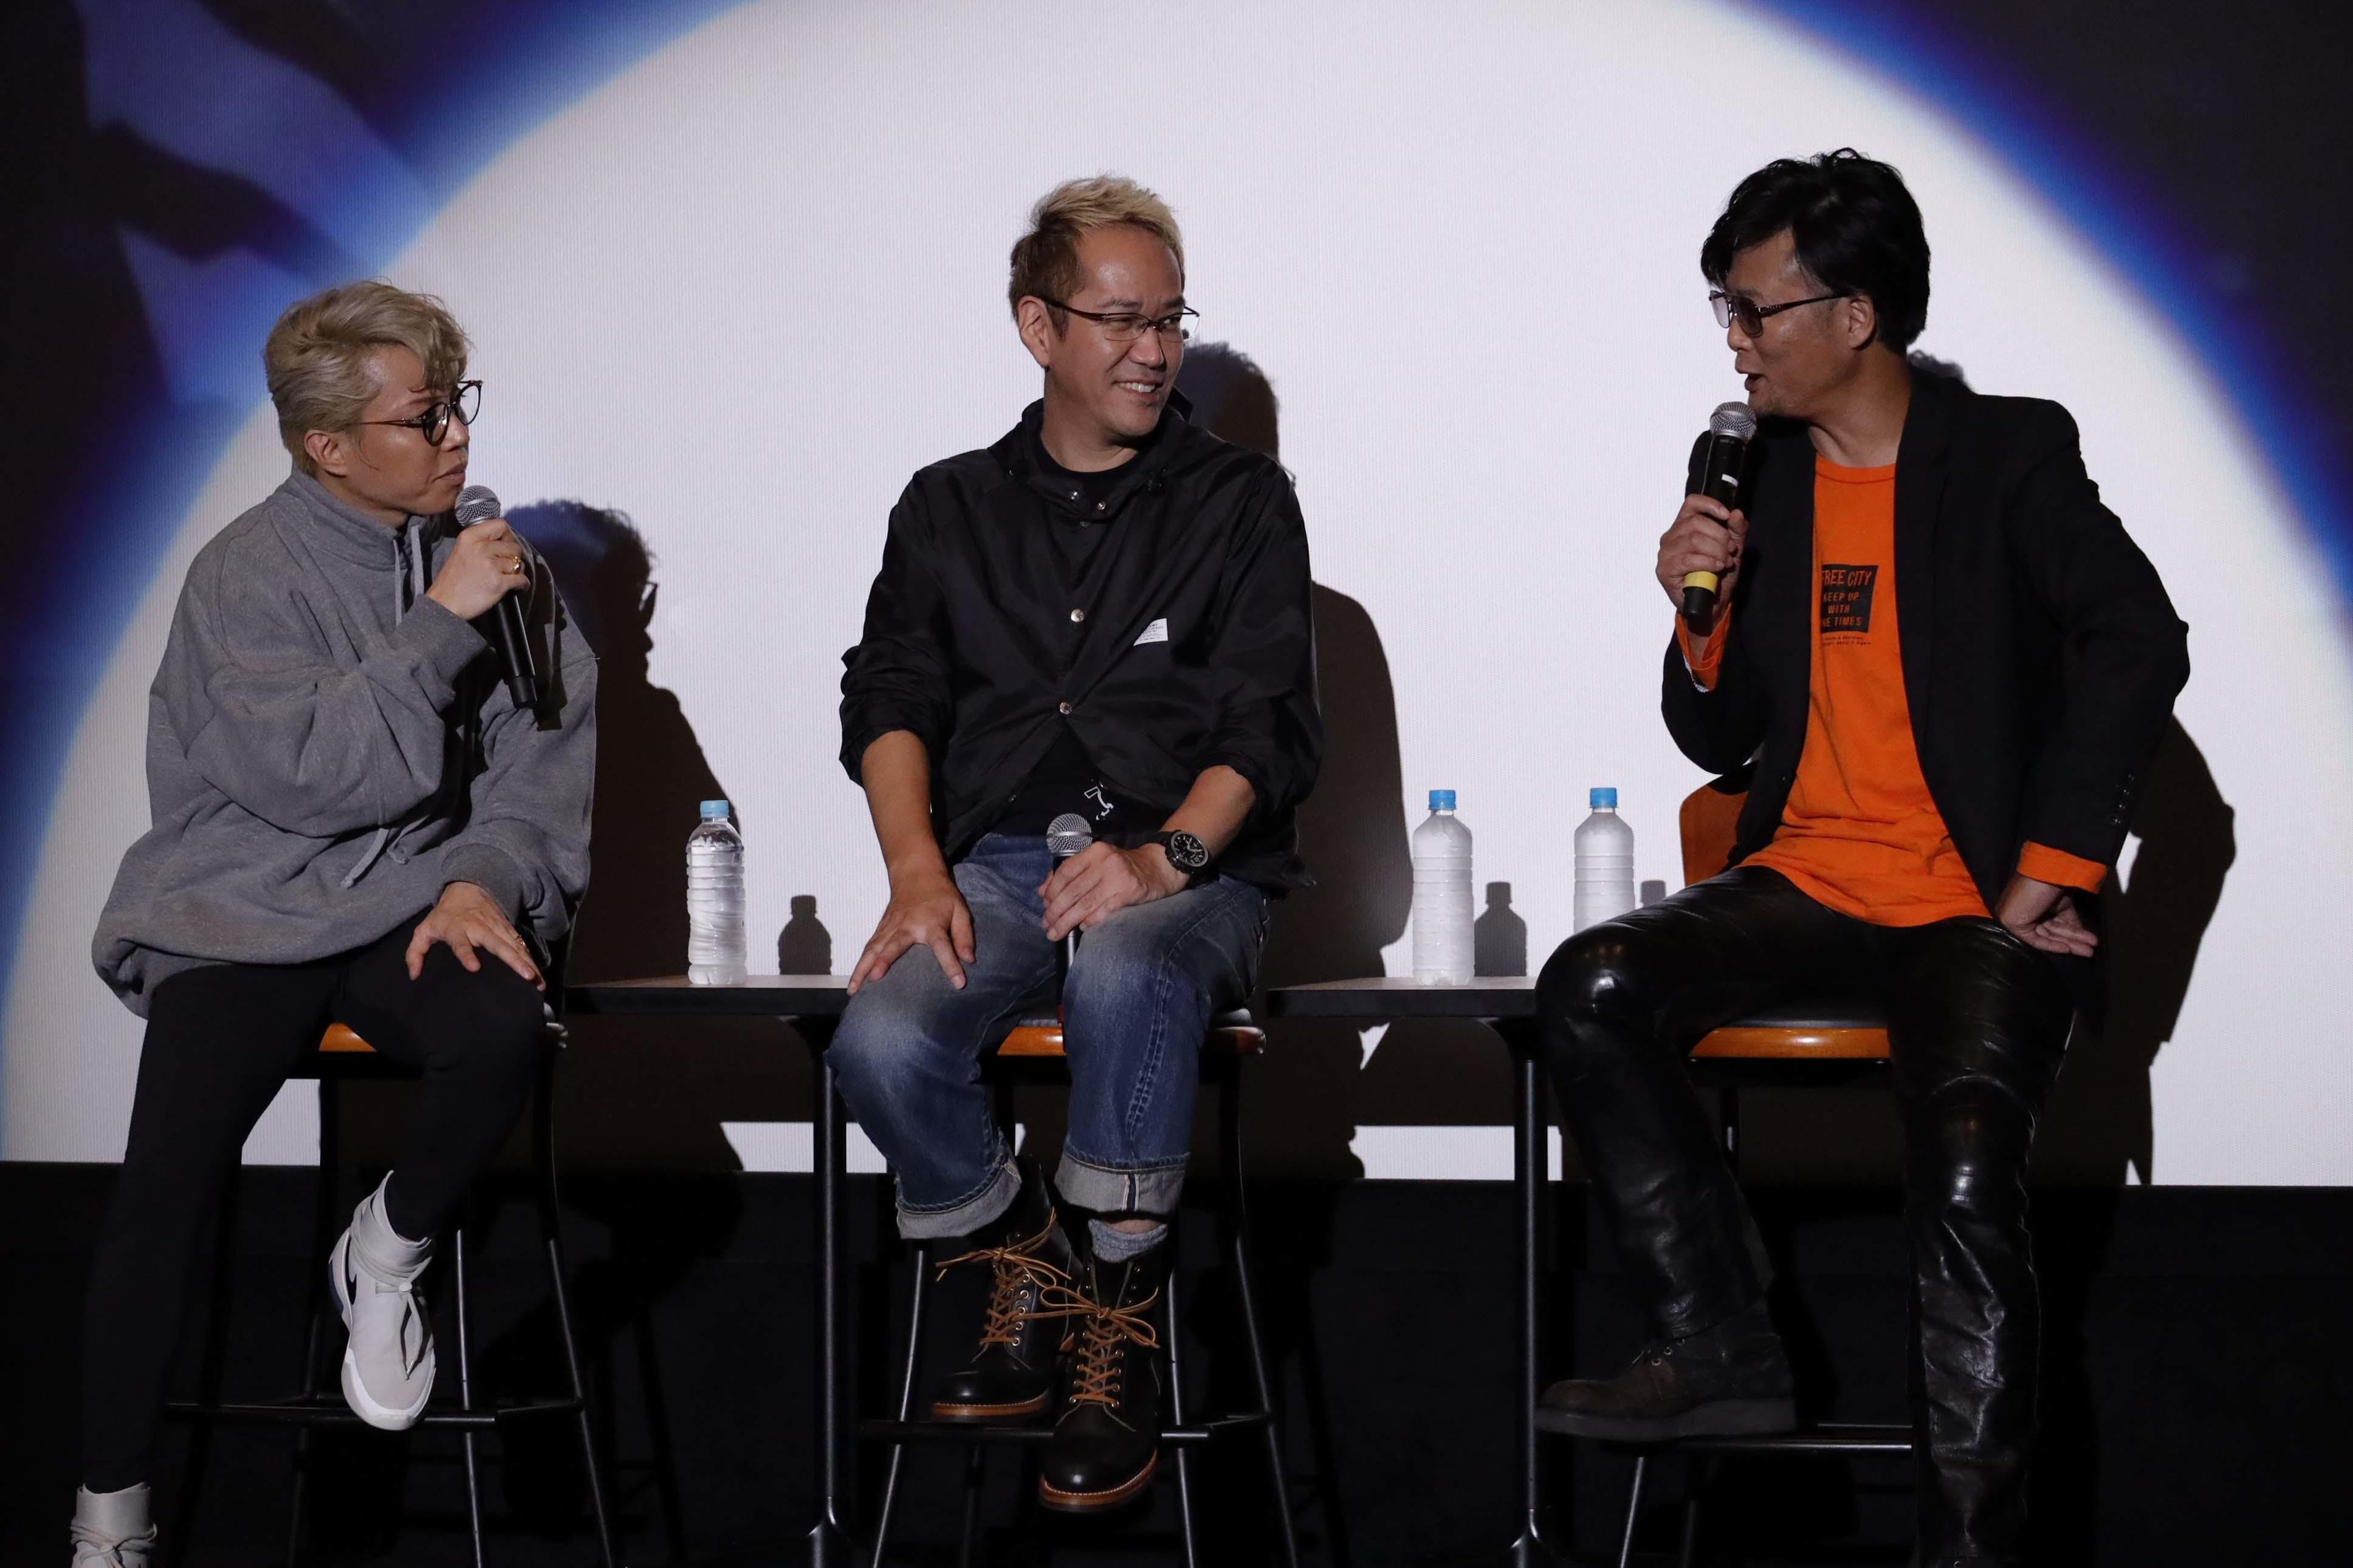 左から、西川貴教、神山健治監督、A.T.氏